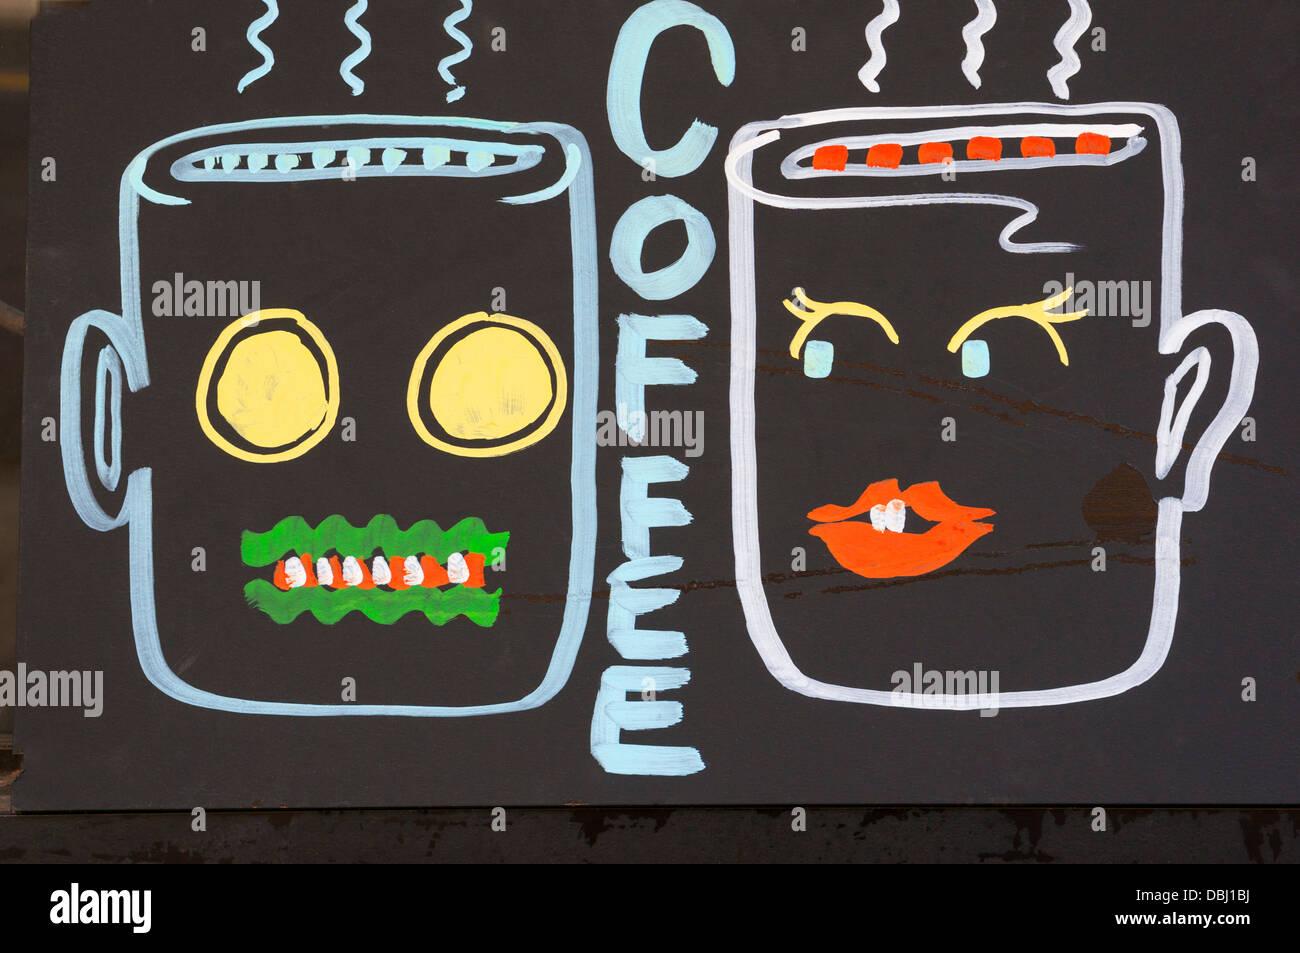 Coffee mugs cartoon in restaurant window - Stock Image